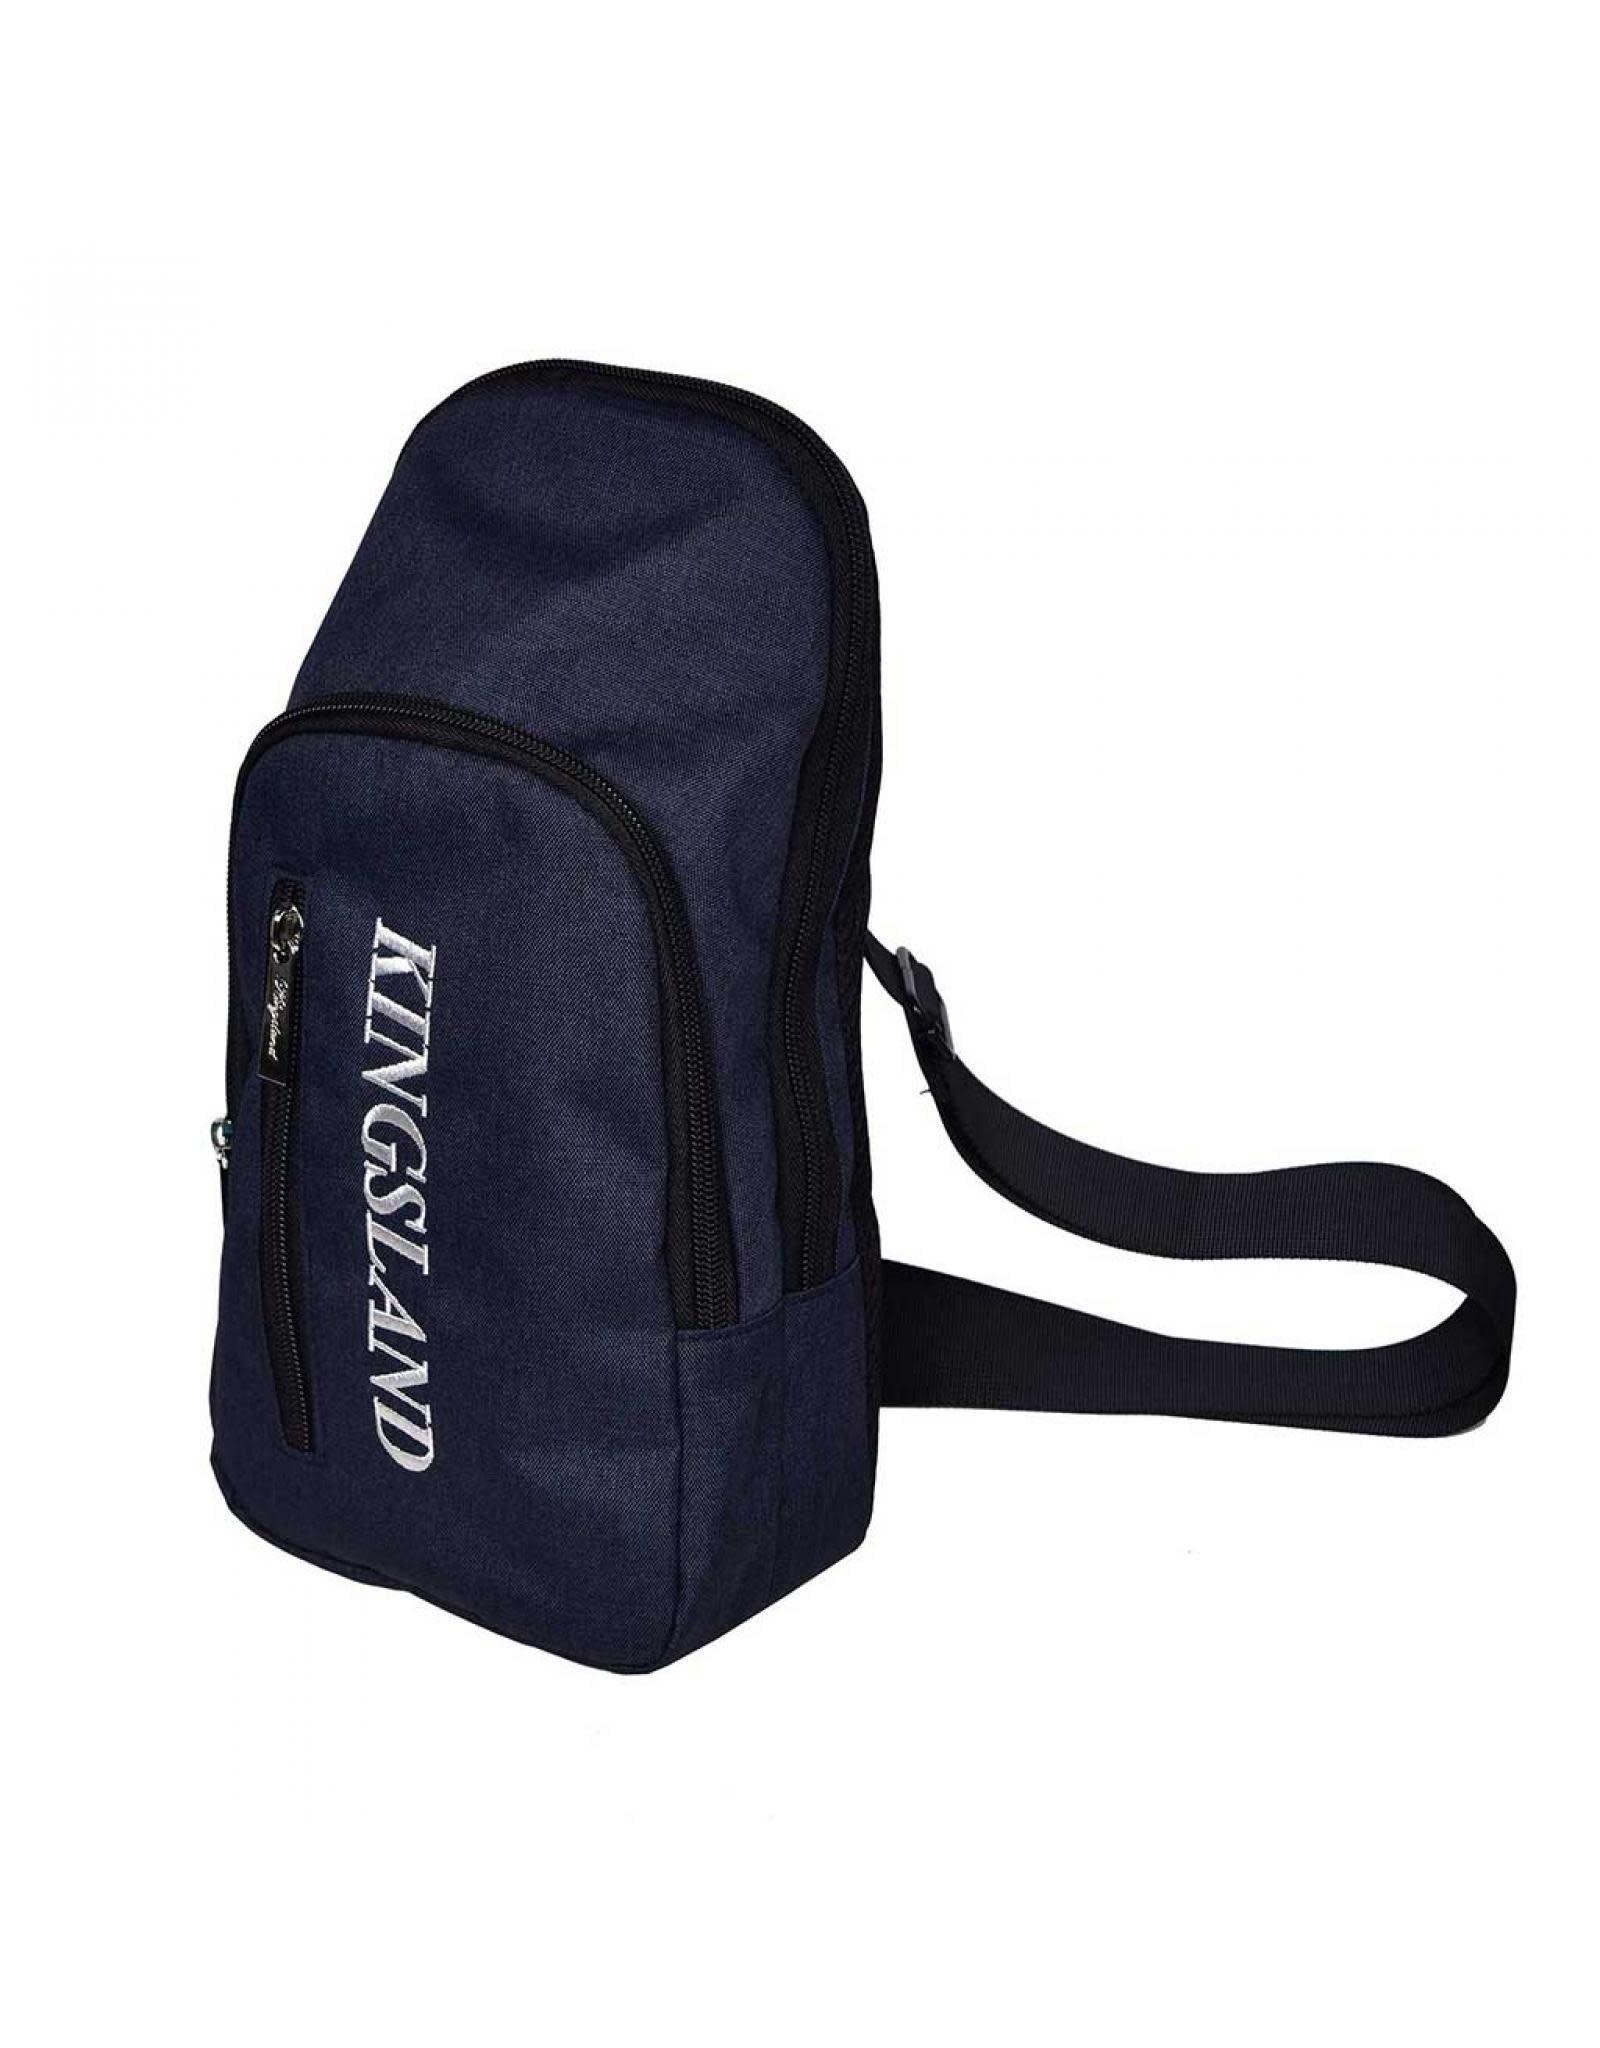 Kingsland KL Lael Cross Body Bag Navy